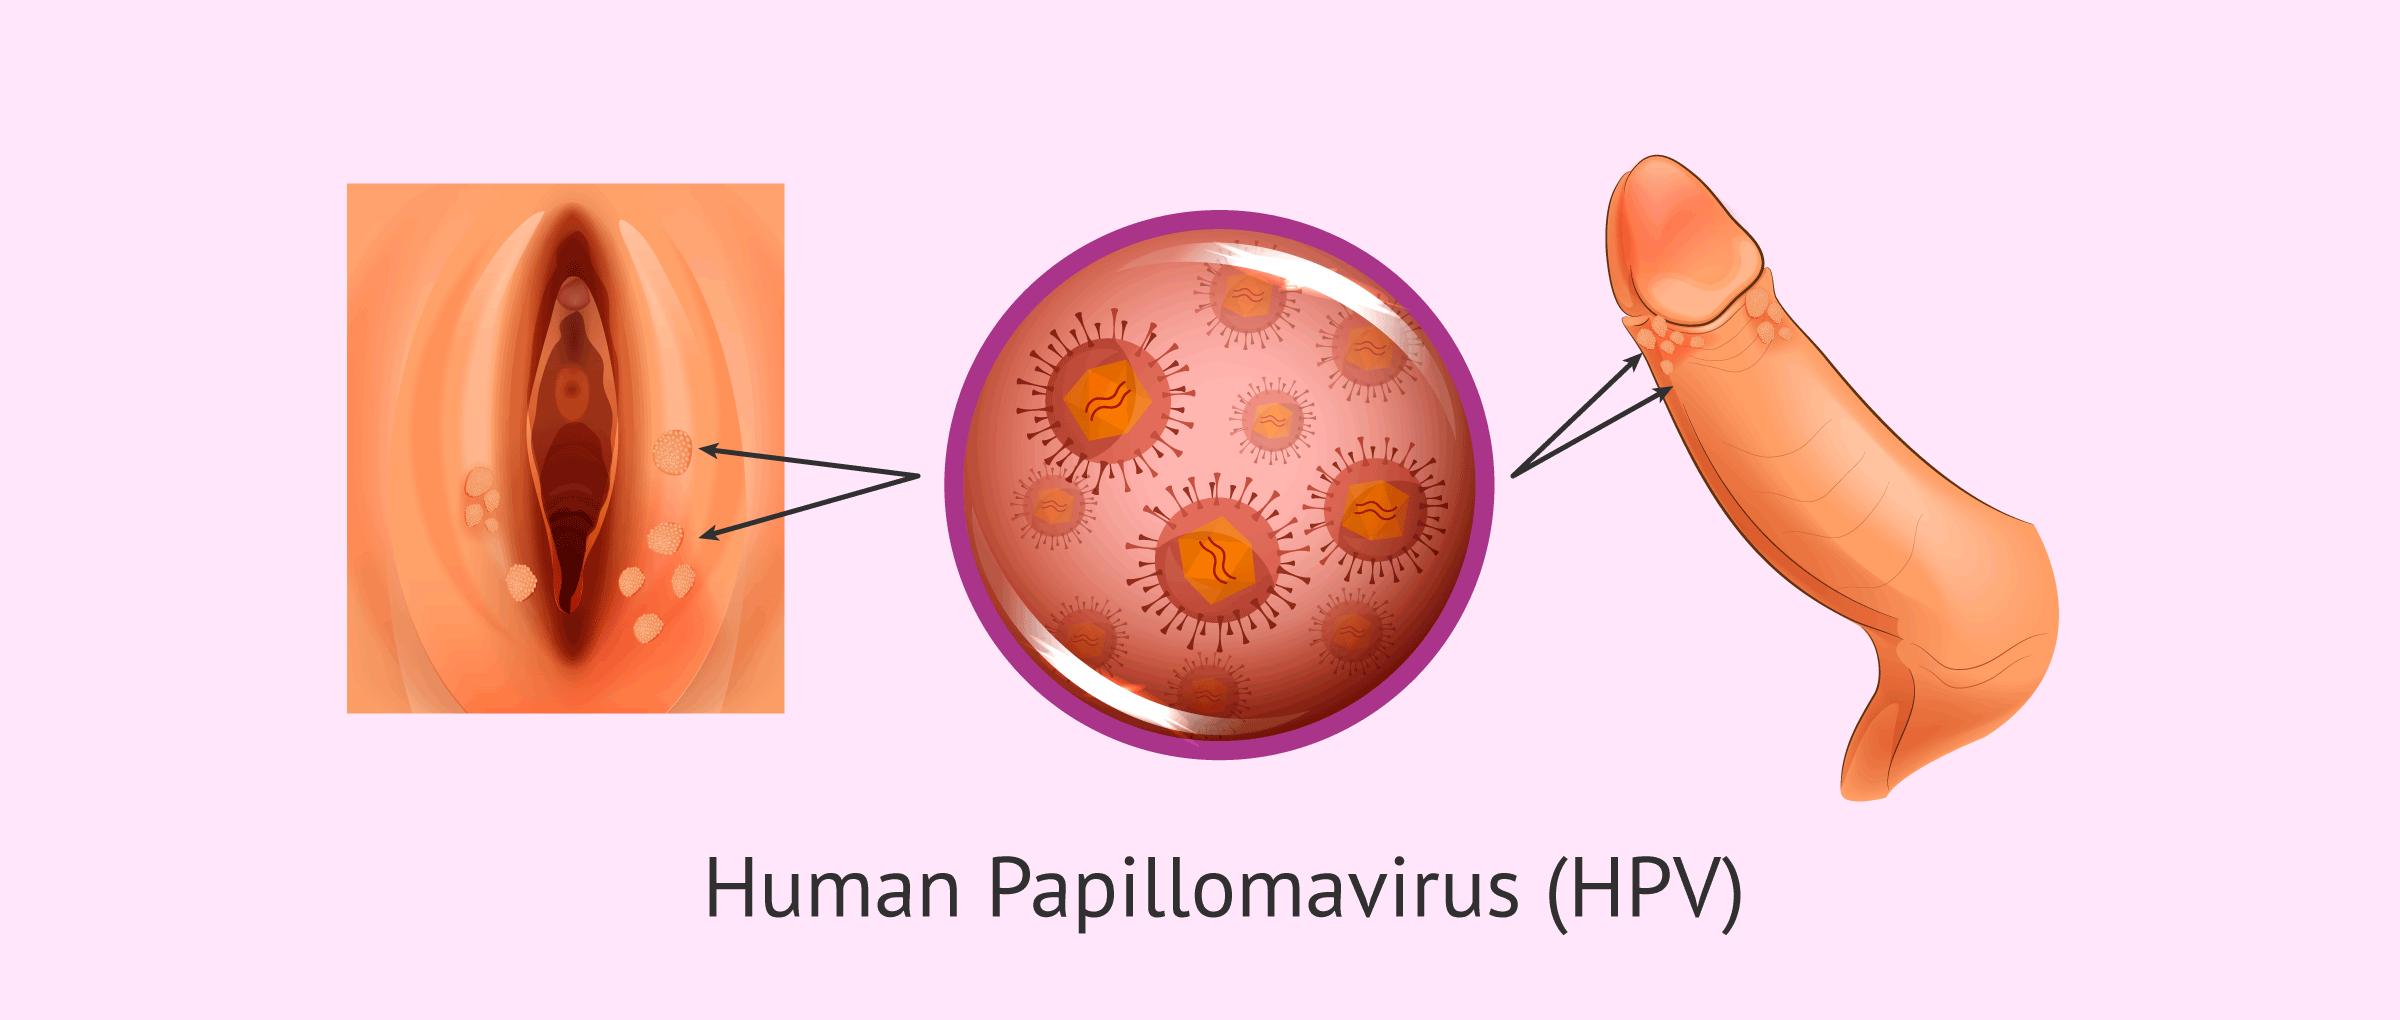 can hpv virus cause bladder infections pastila pentru prevenirea viermilor la om